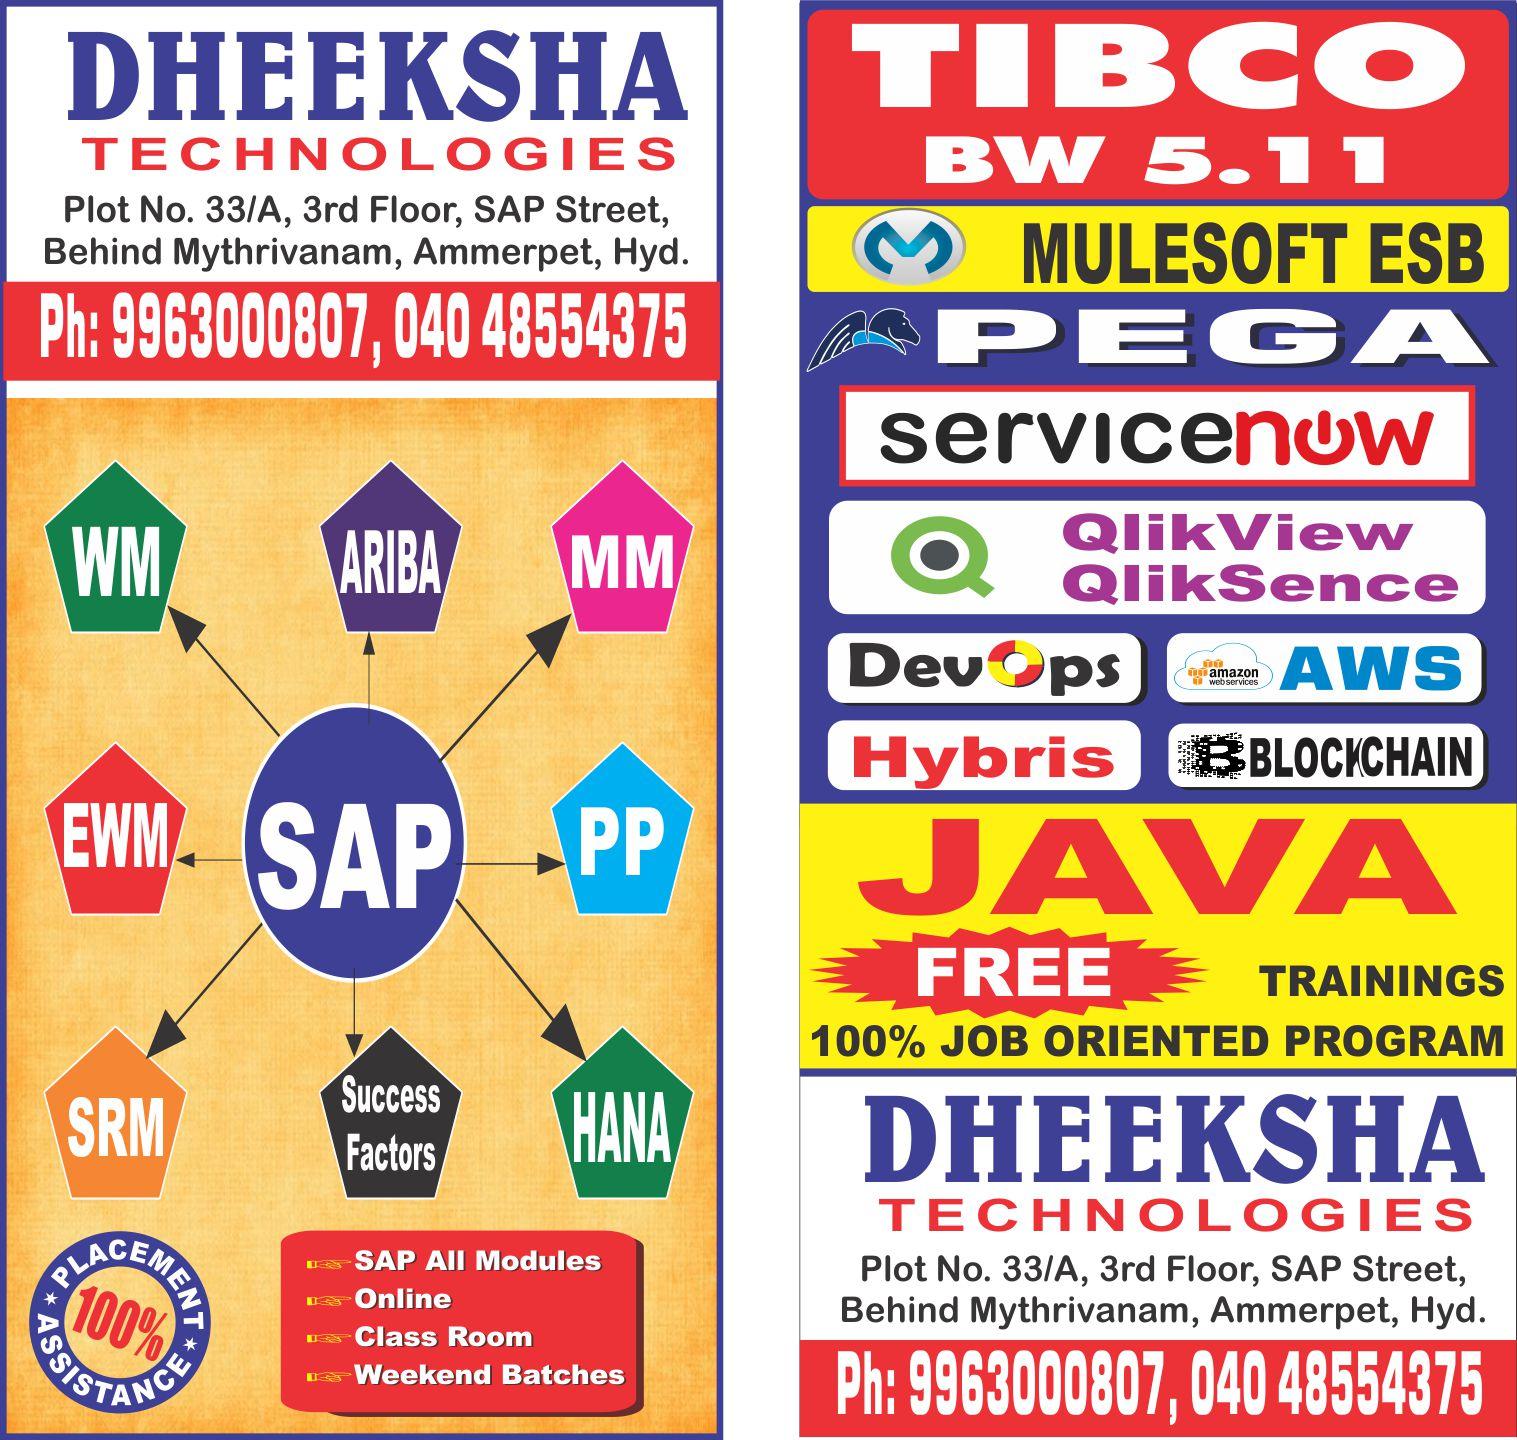 Deeksha Technologies in Ameerpet, Hyderabad-500016 | Sulekha Hyderabad